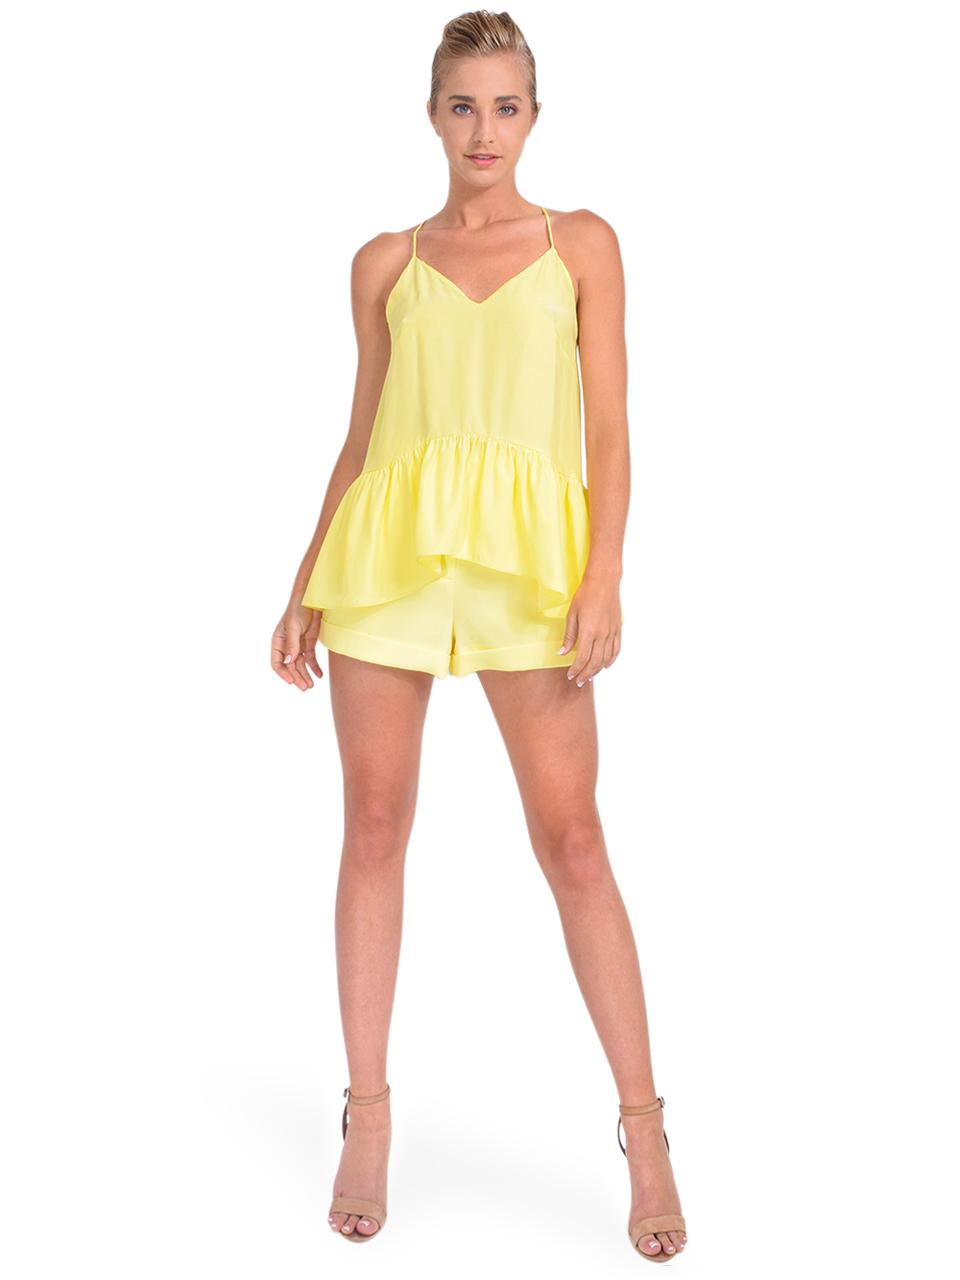 Cinq à Sept Janet Ruffle Hem Top Full Outfit